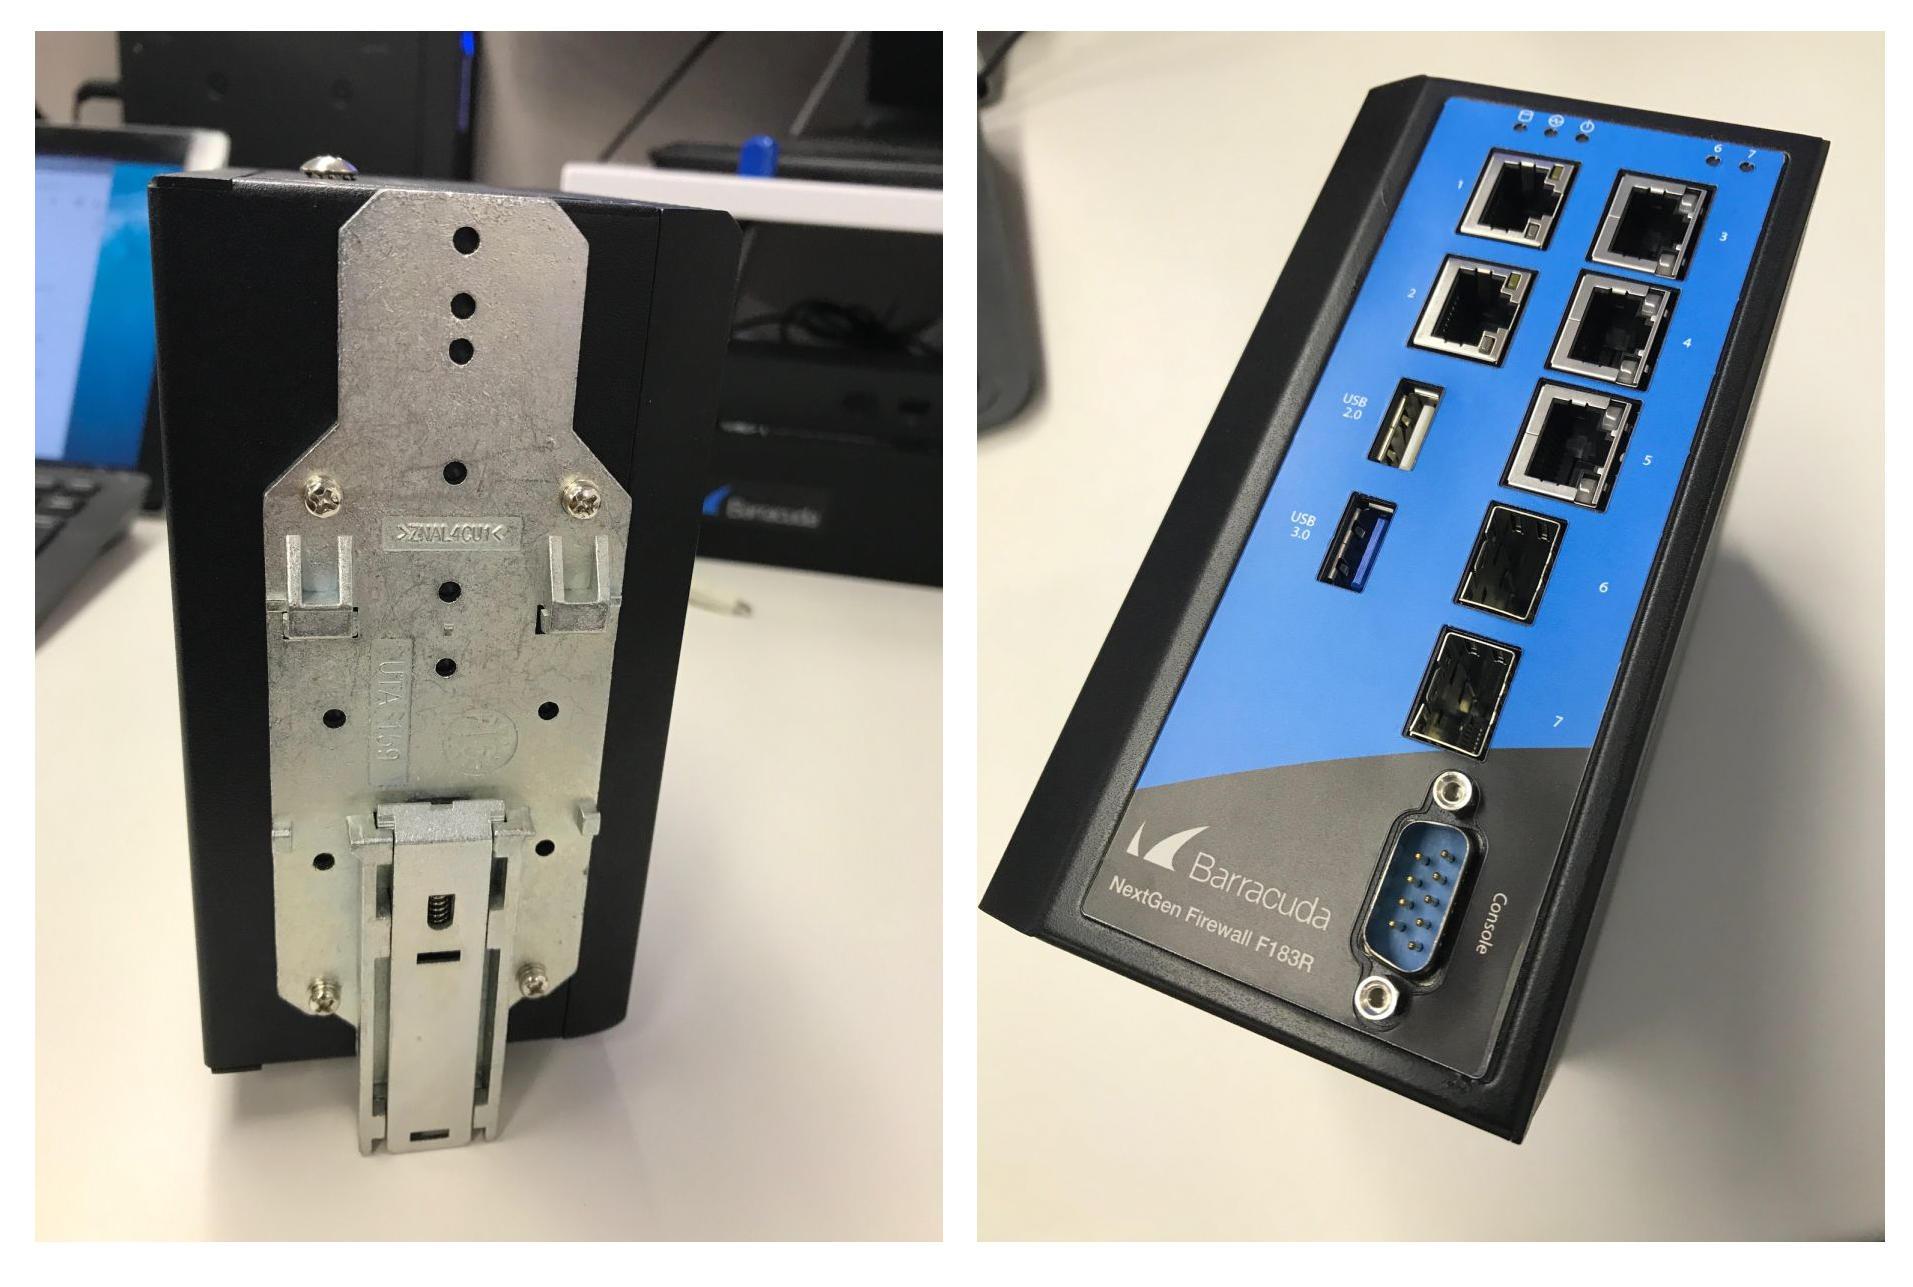 DINレール、DC電源に対応するCloudGen Firewall F180R